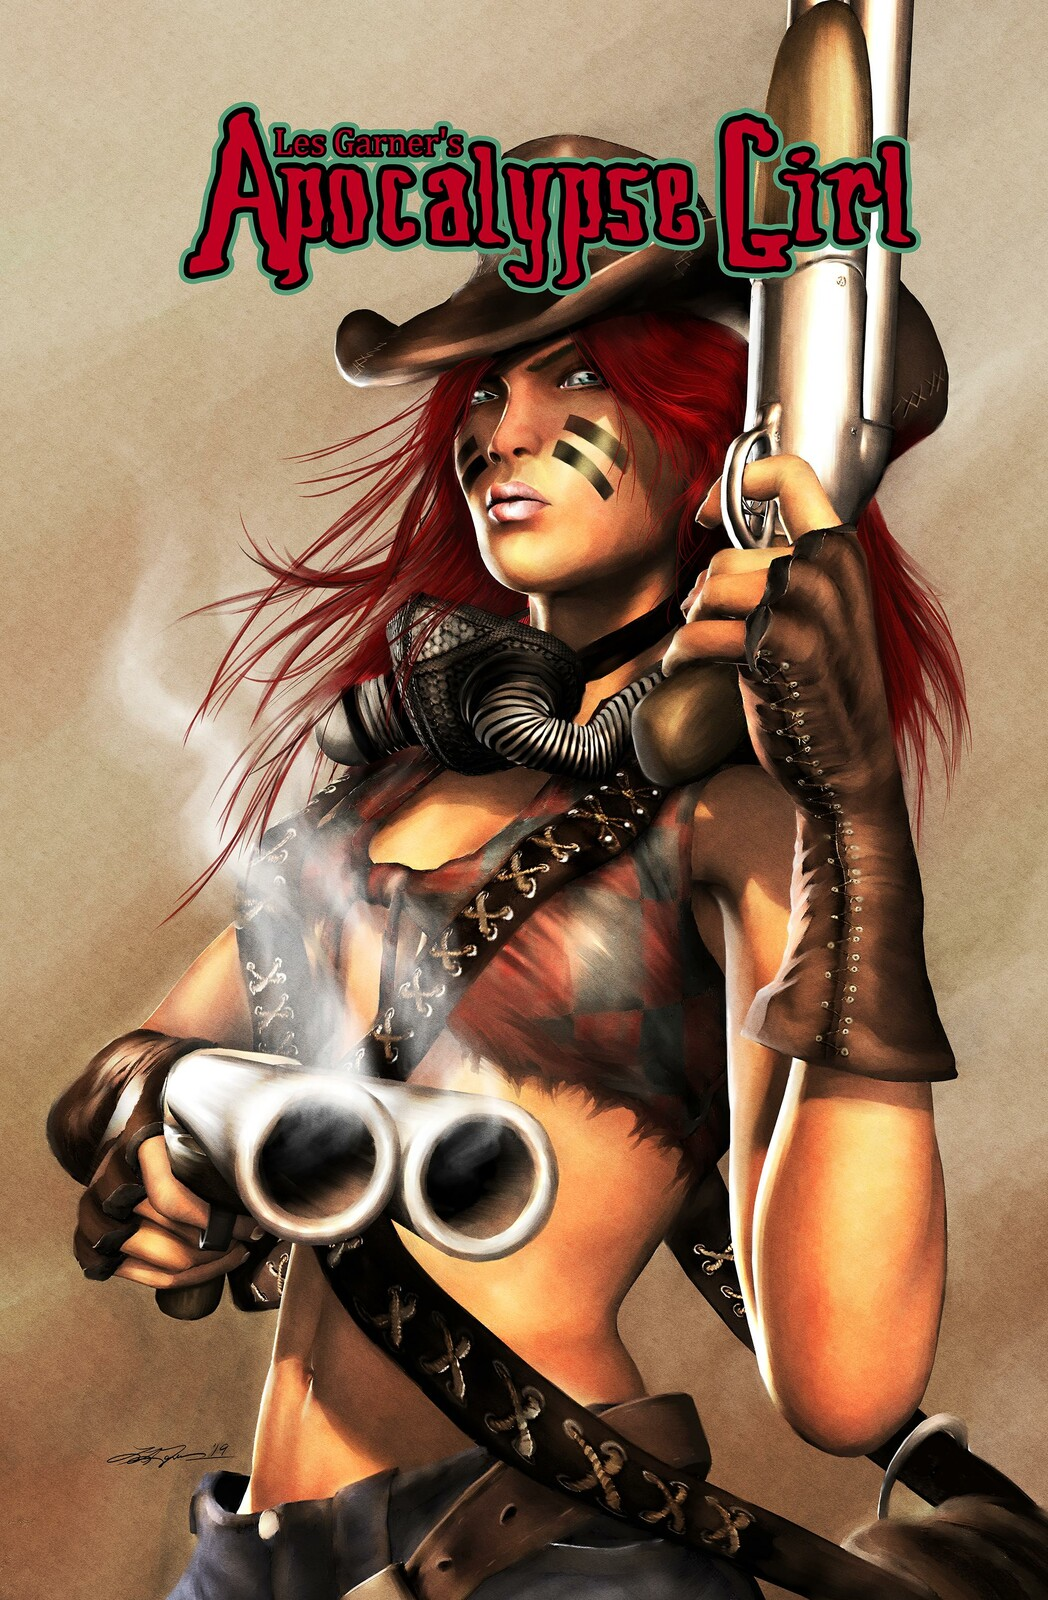 Les Garner's Apocalypse Girl Promos/Covers Roundup